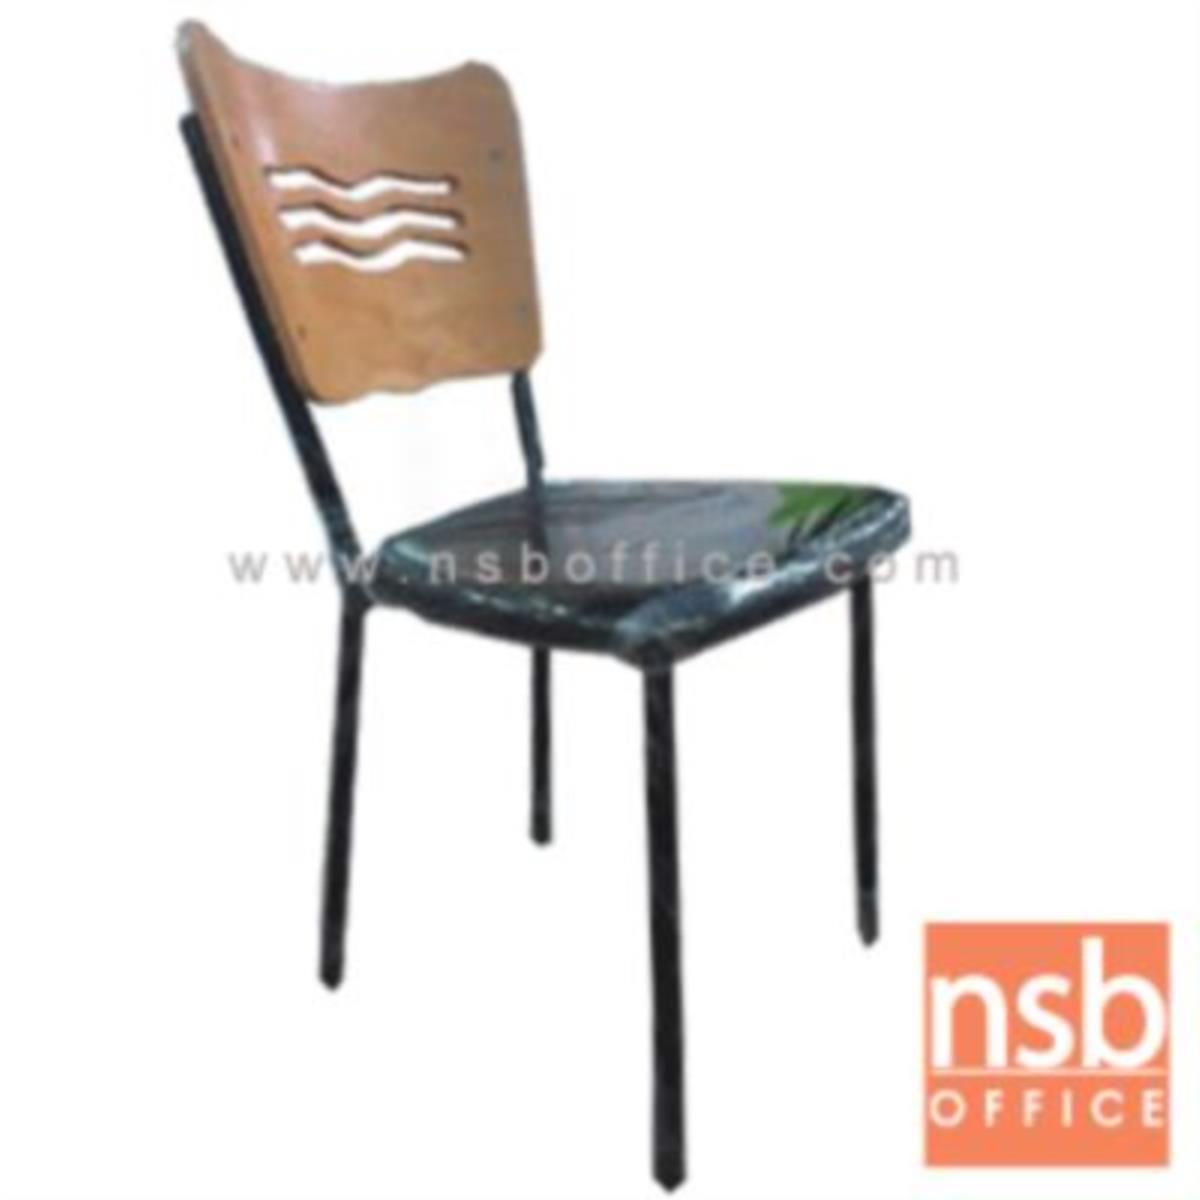 G14A128:เก้าอี้อเนกประสงค์  รุ่น Sign (ไซน์)  ขาเหล็กพ่นดำ